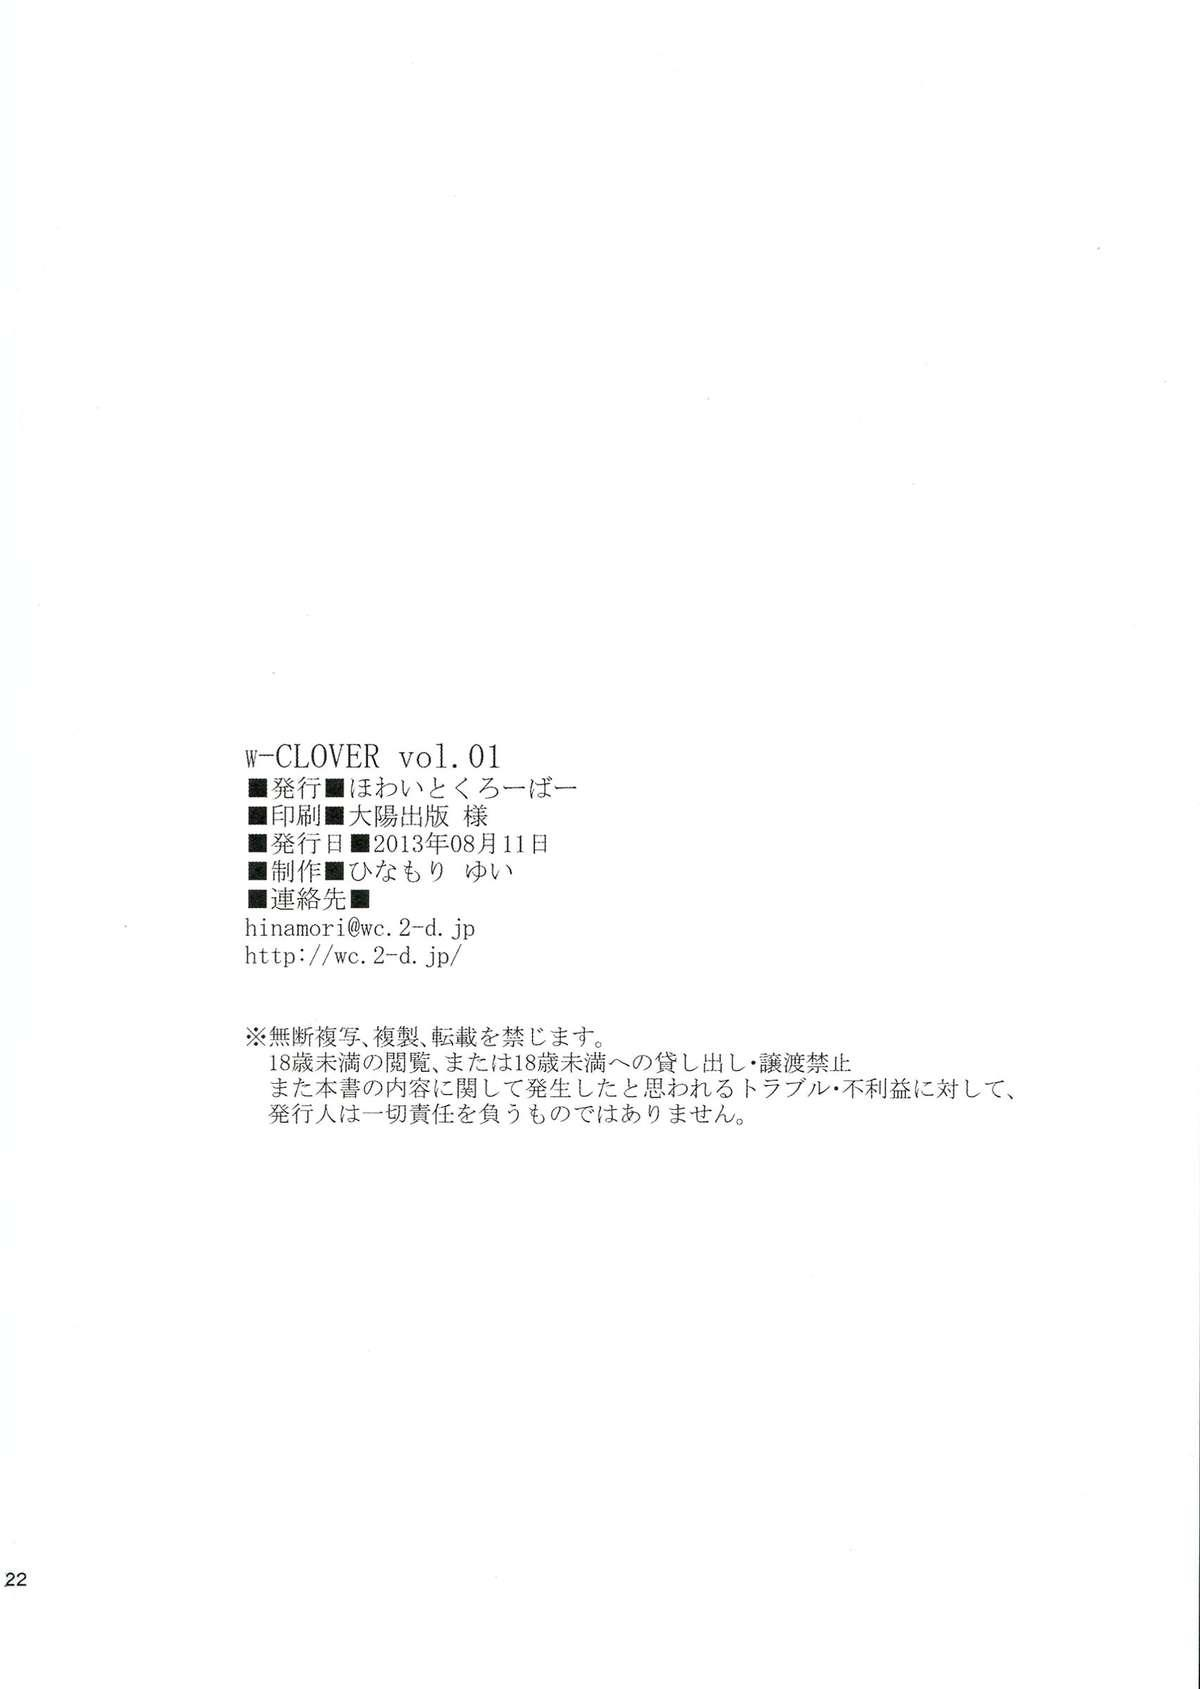 W-CLOVER vol.01 21